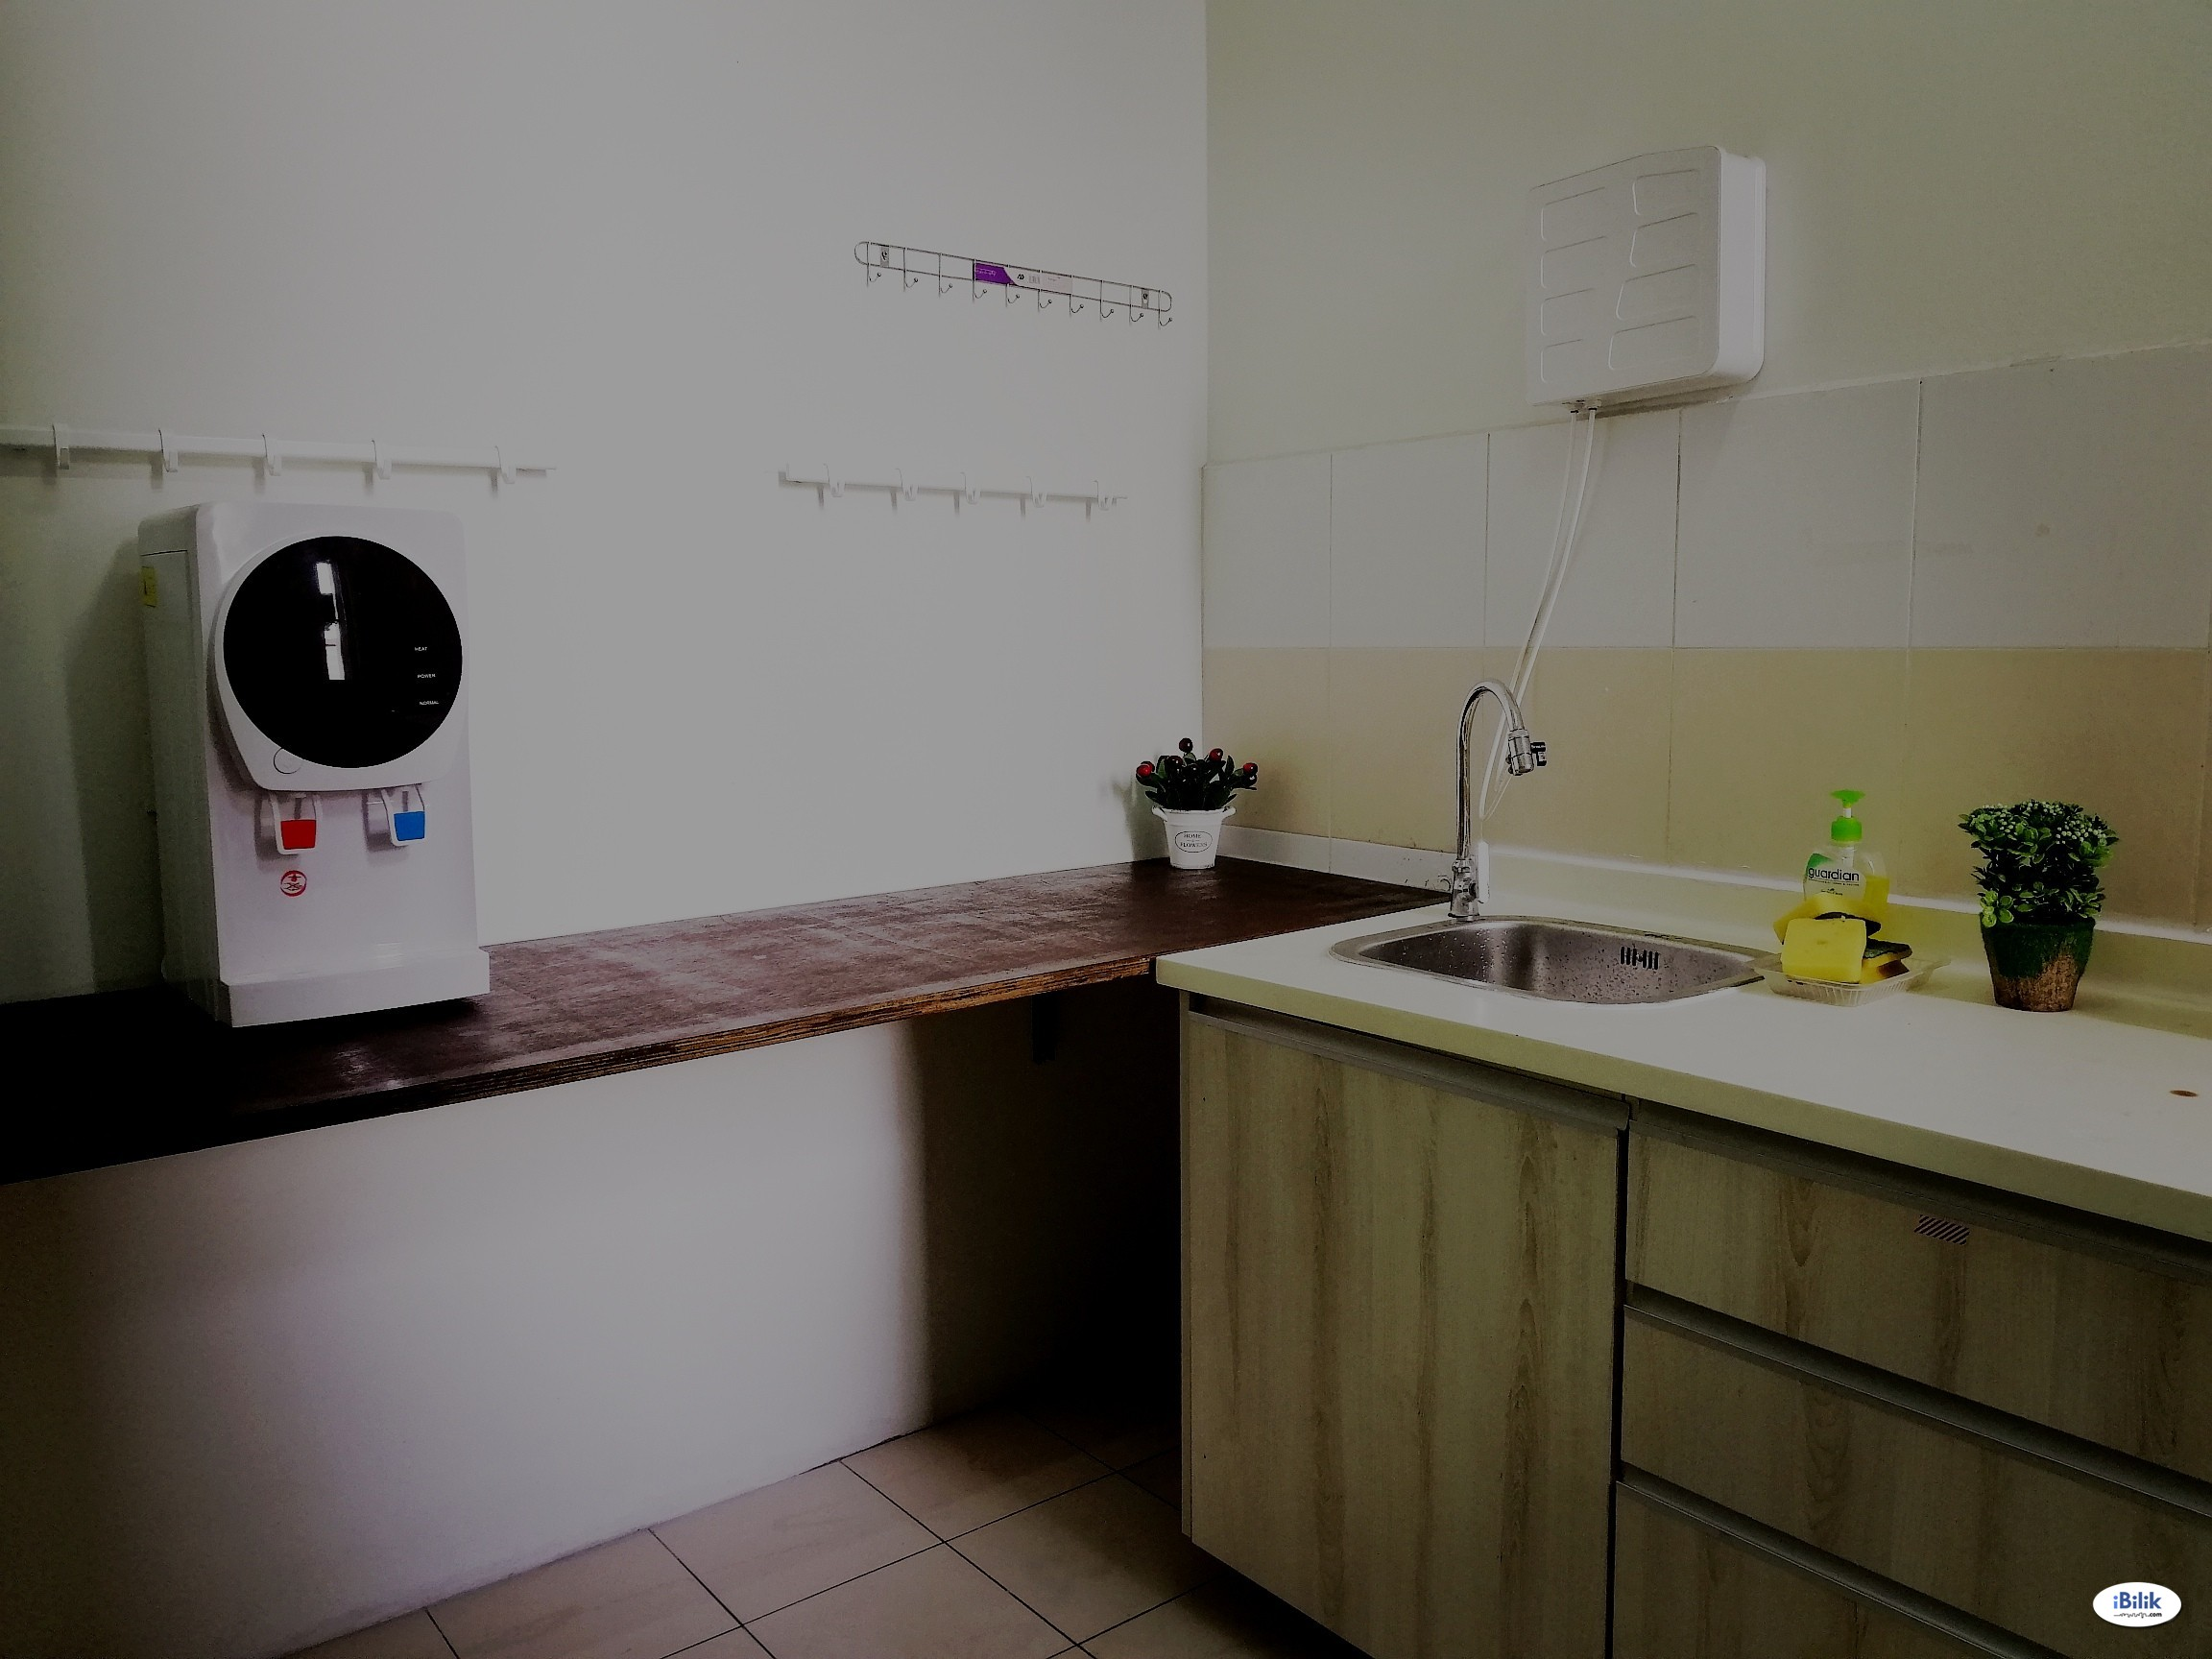 Middle Room at Pacific Place, Ara Damansara